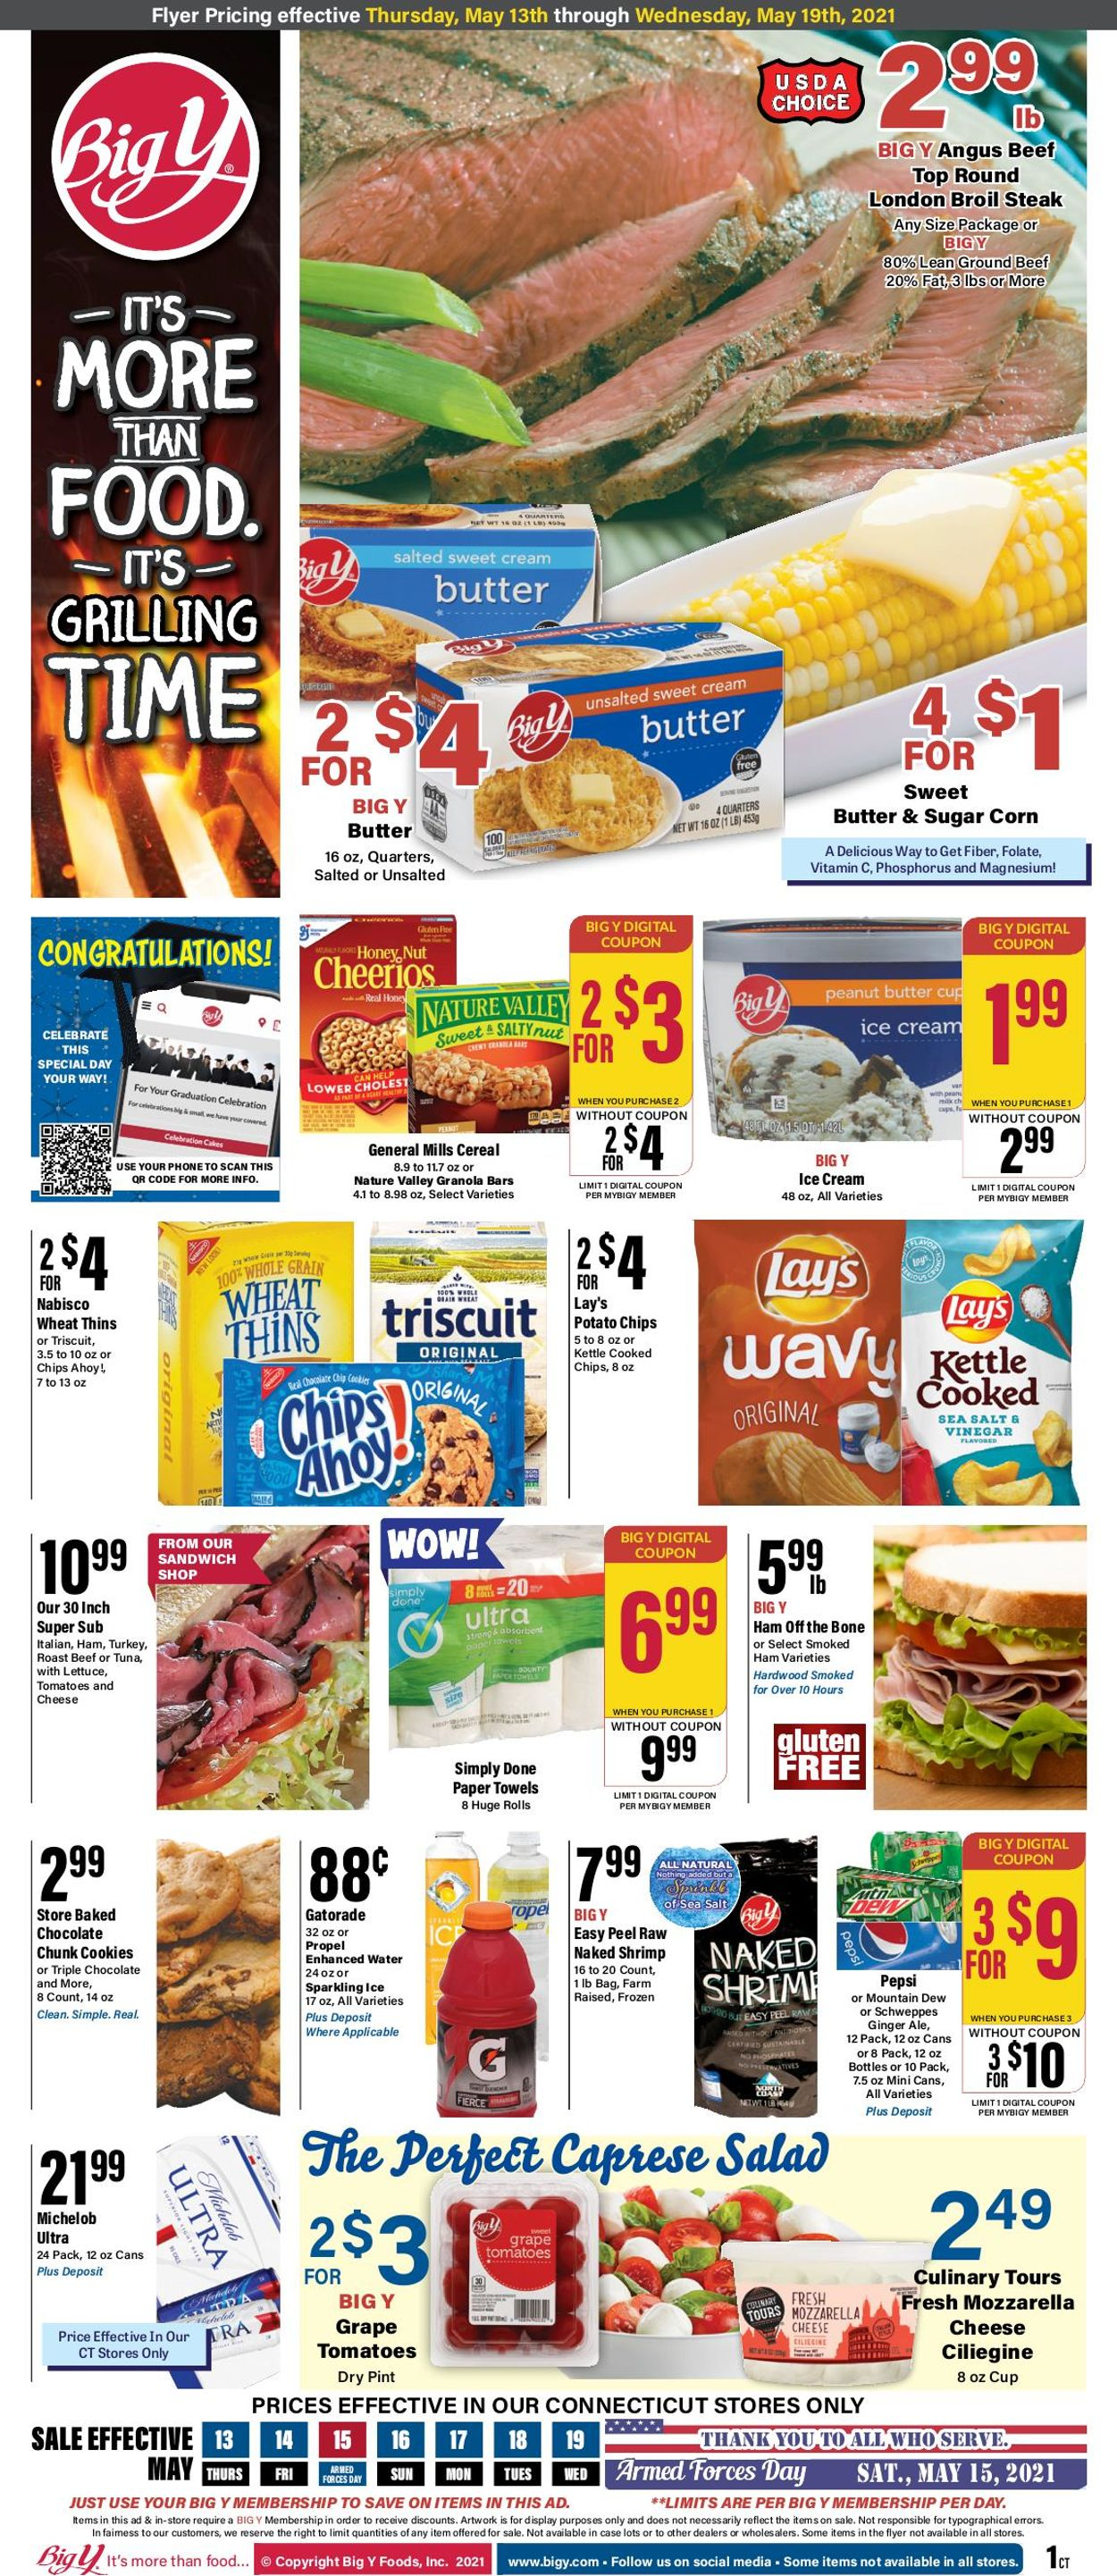 Big Y Weekly Ad Circular - valid 05/13-05/19/2021